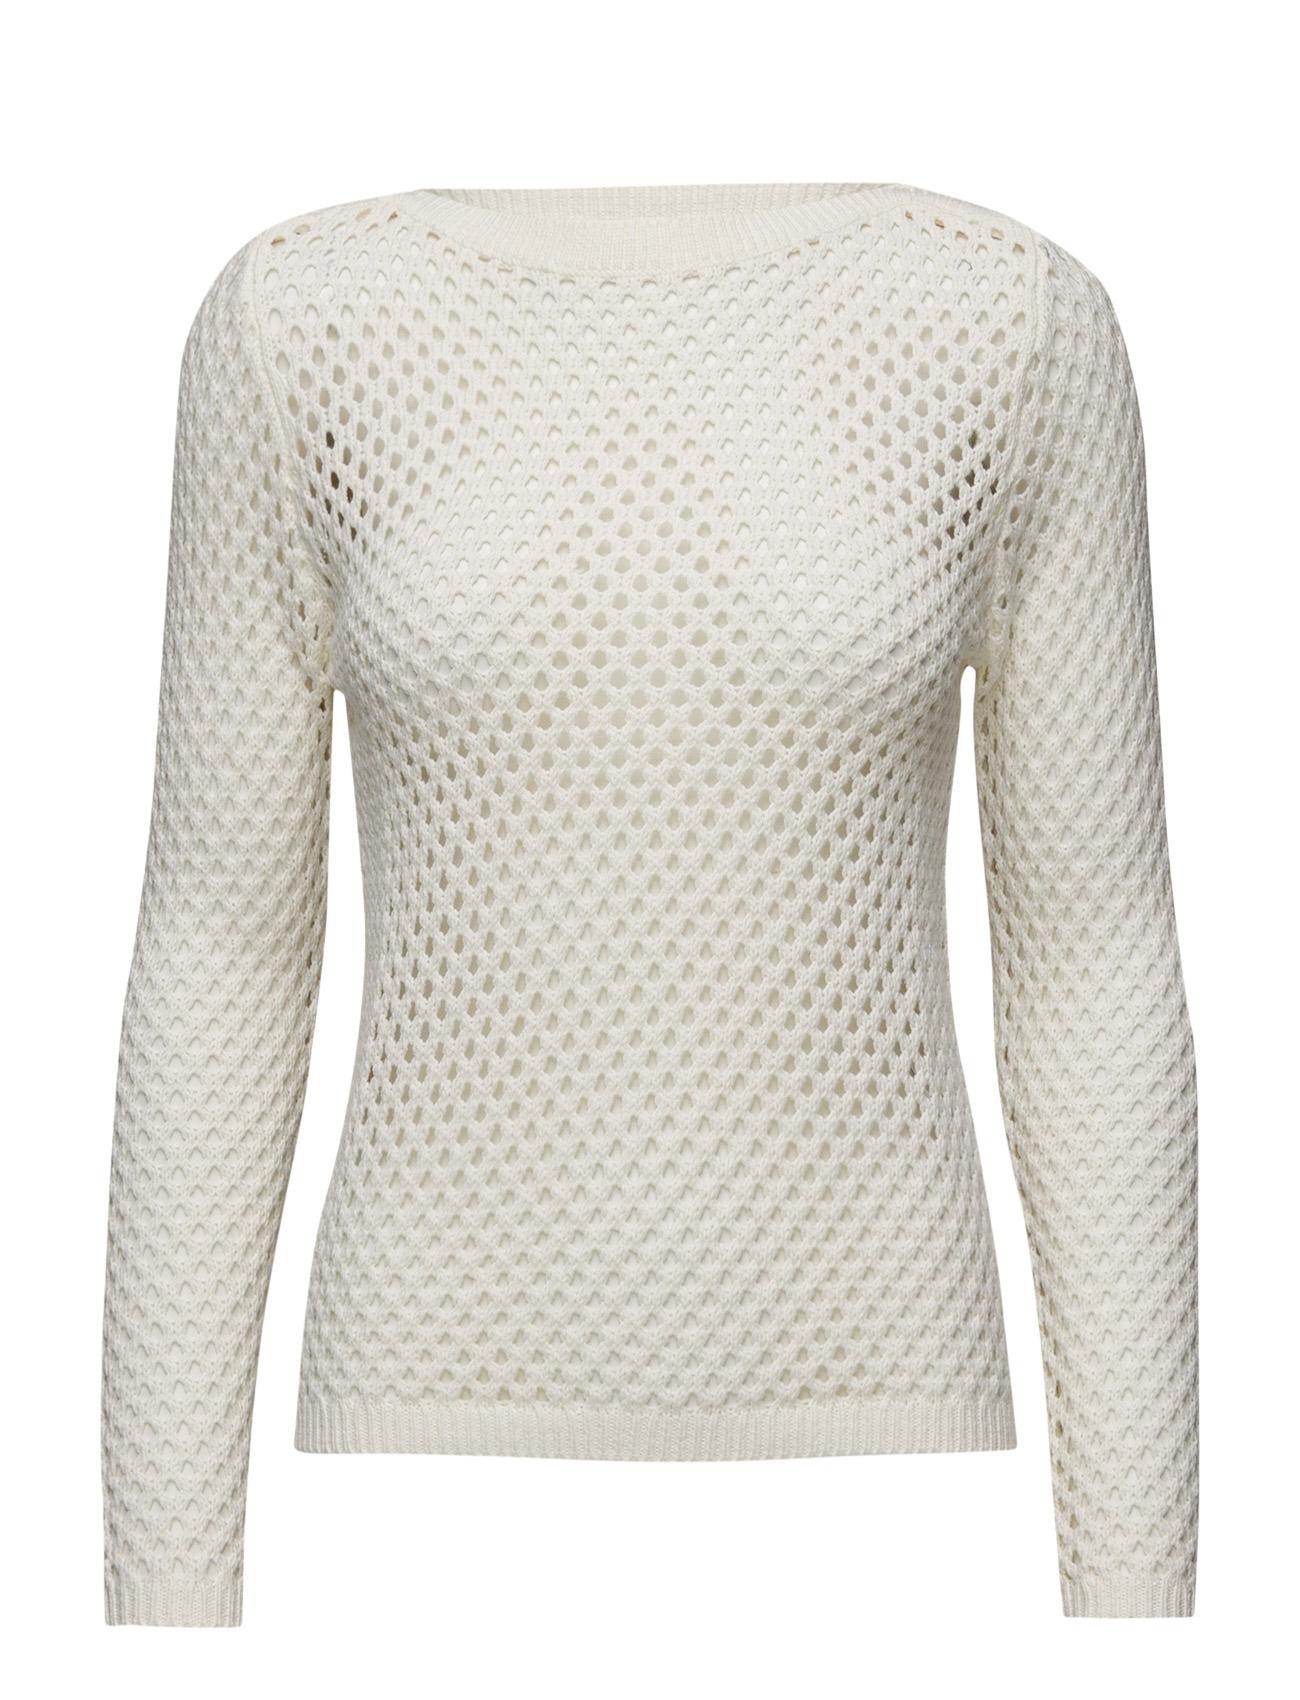 Cibyll Pu Part Two Sweatshirts til Damer i